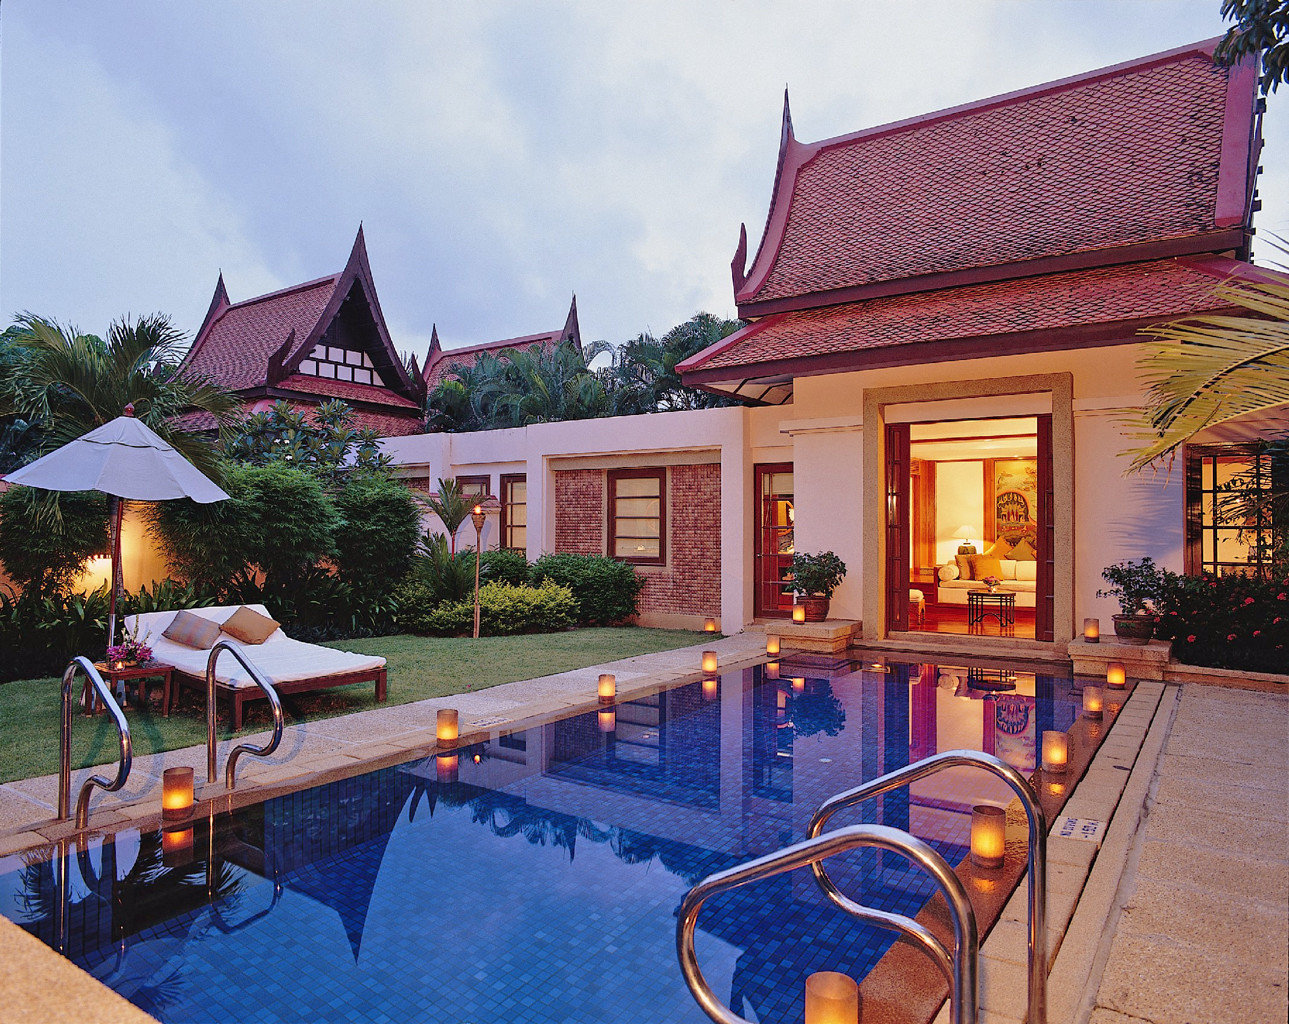 Beach Hotels Phuket Thailand outdoor sky property leisure swimming pool building estate house Resort Villa home vacation backyard cottage real estate hacienda mansion